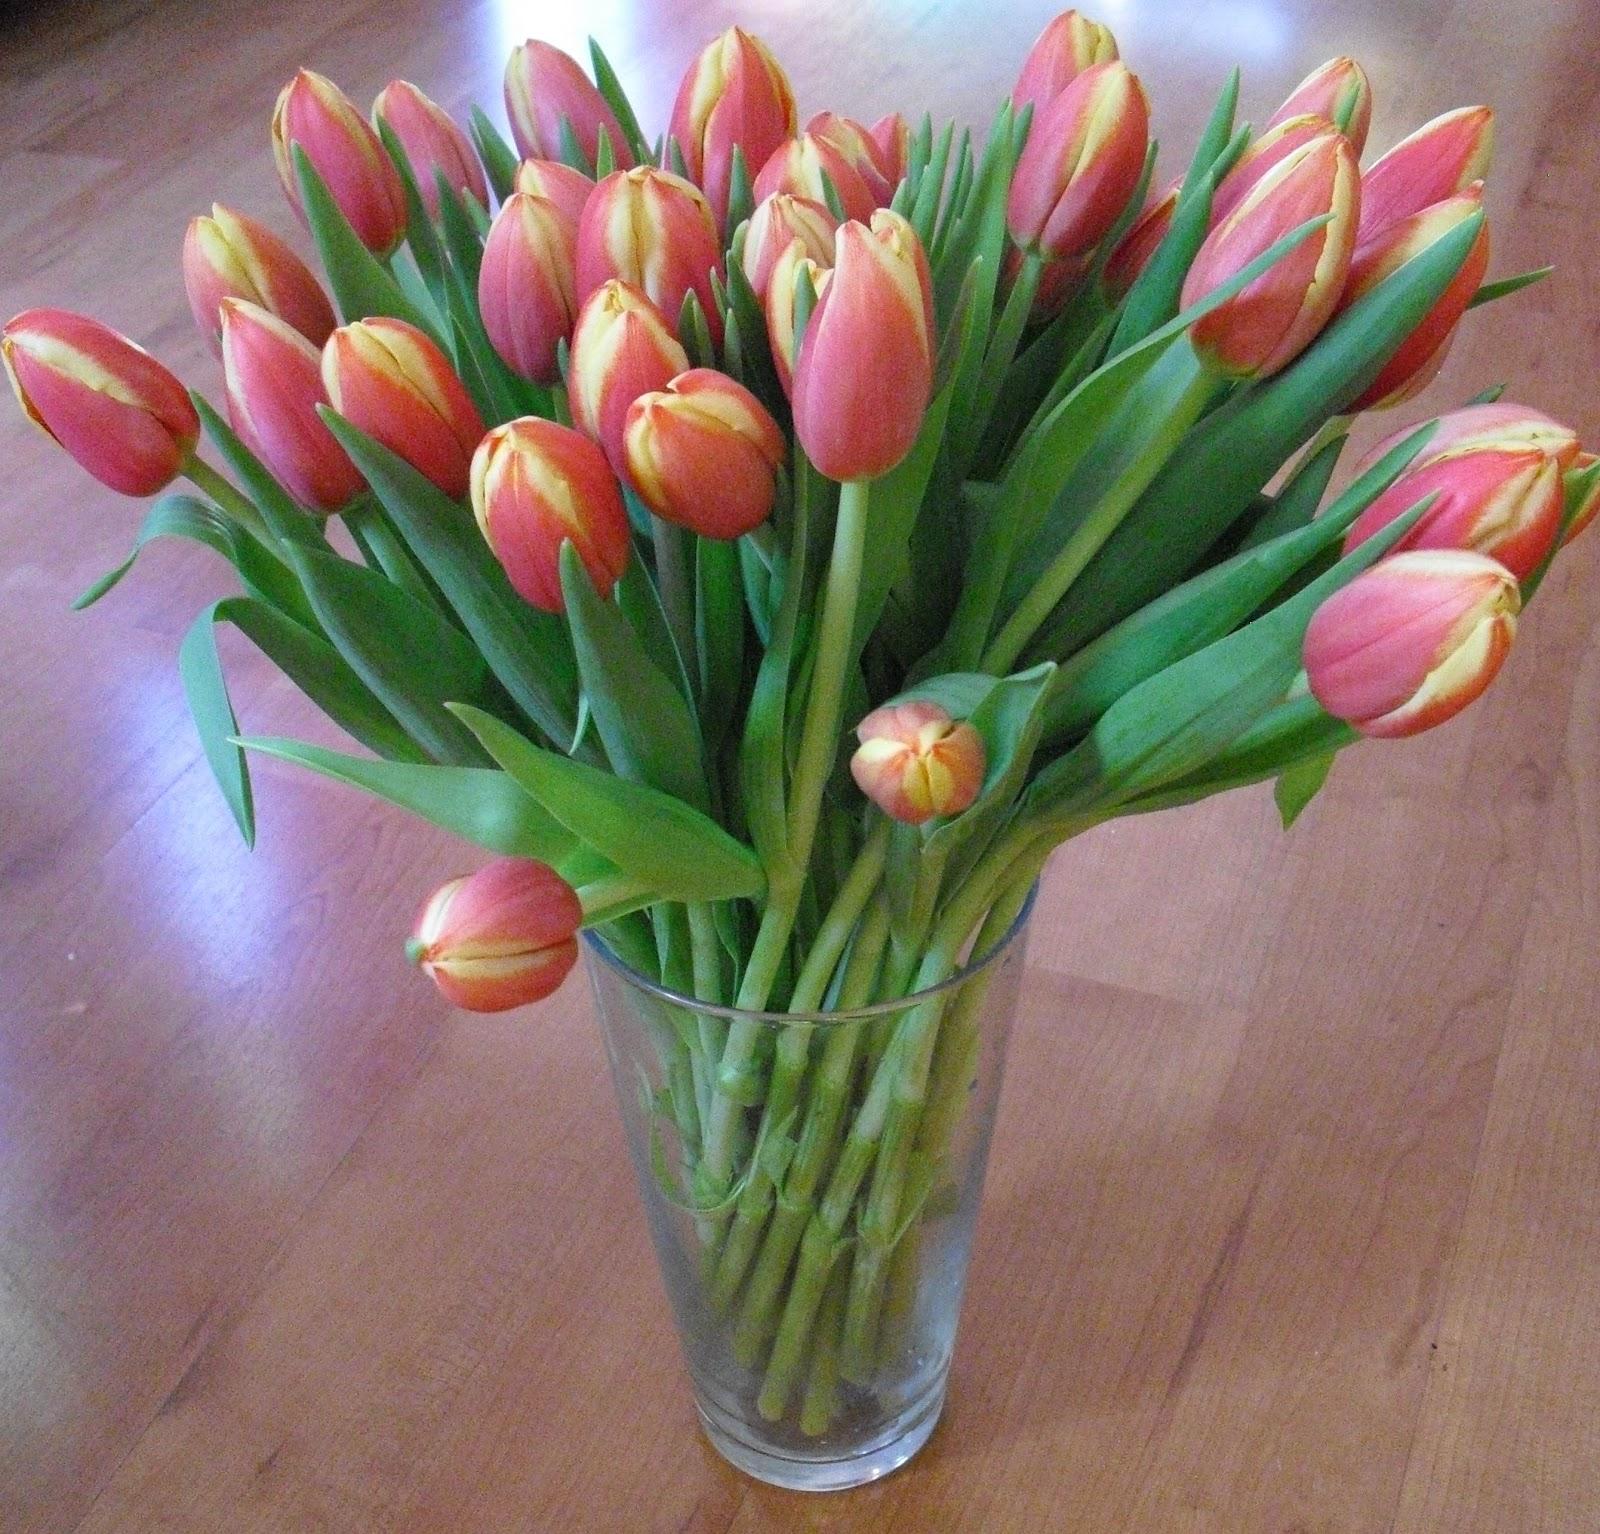 Tulip Amsterdam Keukenhof: When In Amsterdam...: Holland's Keukenhof Gardens Open